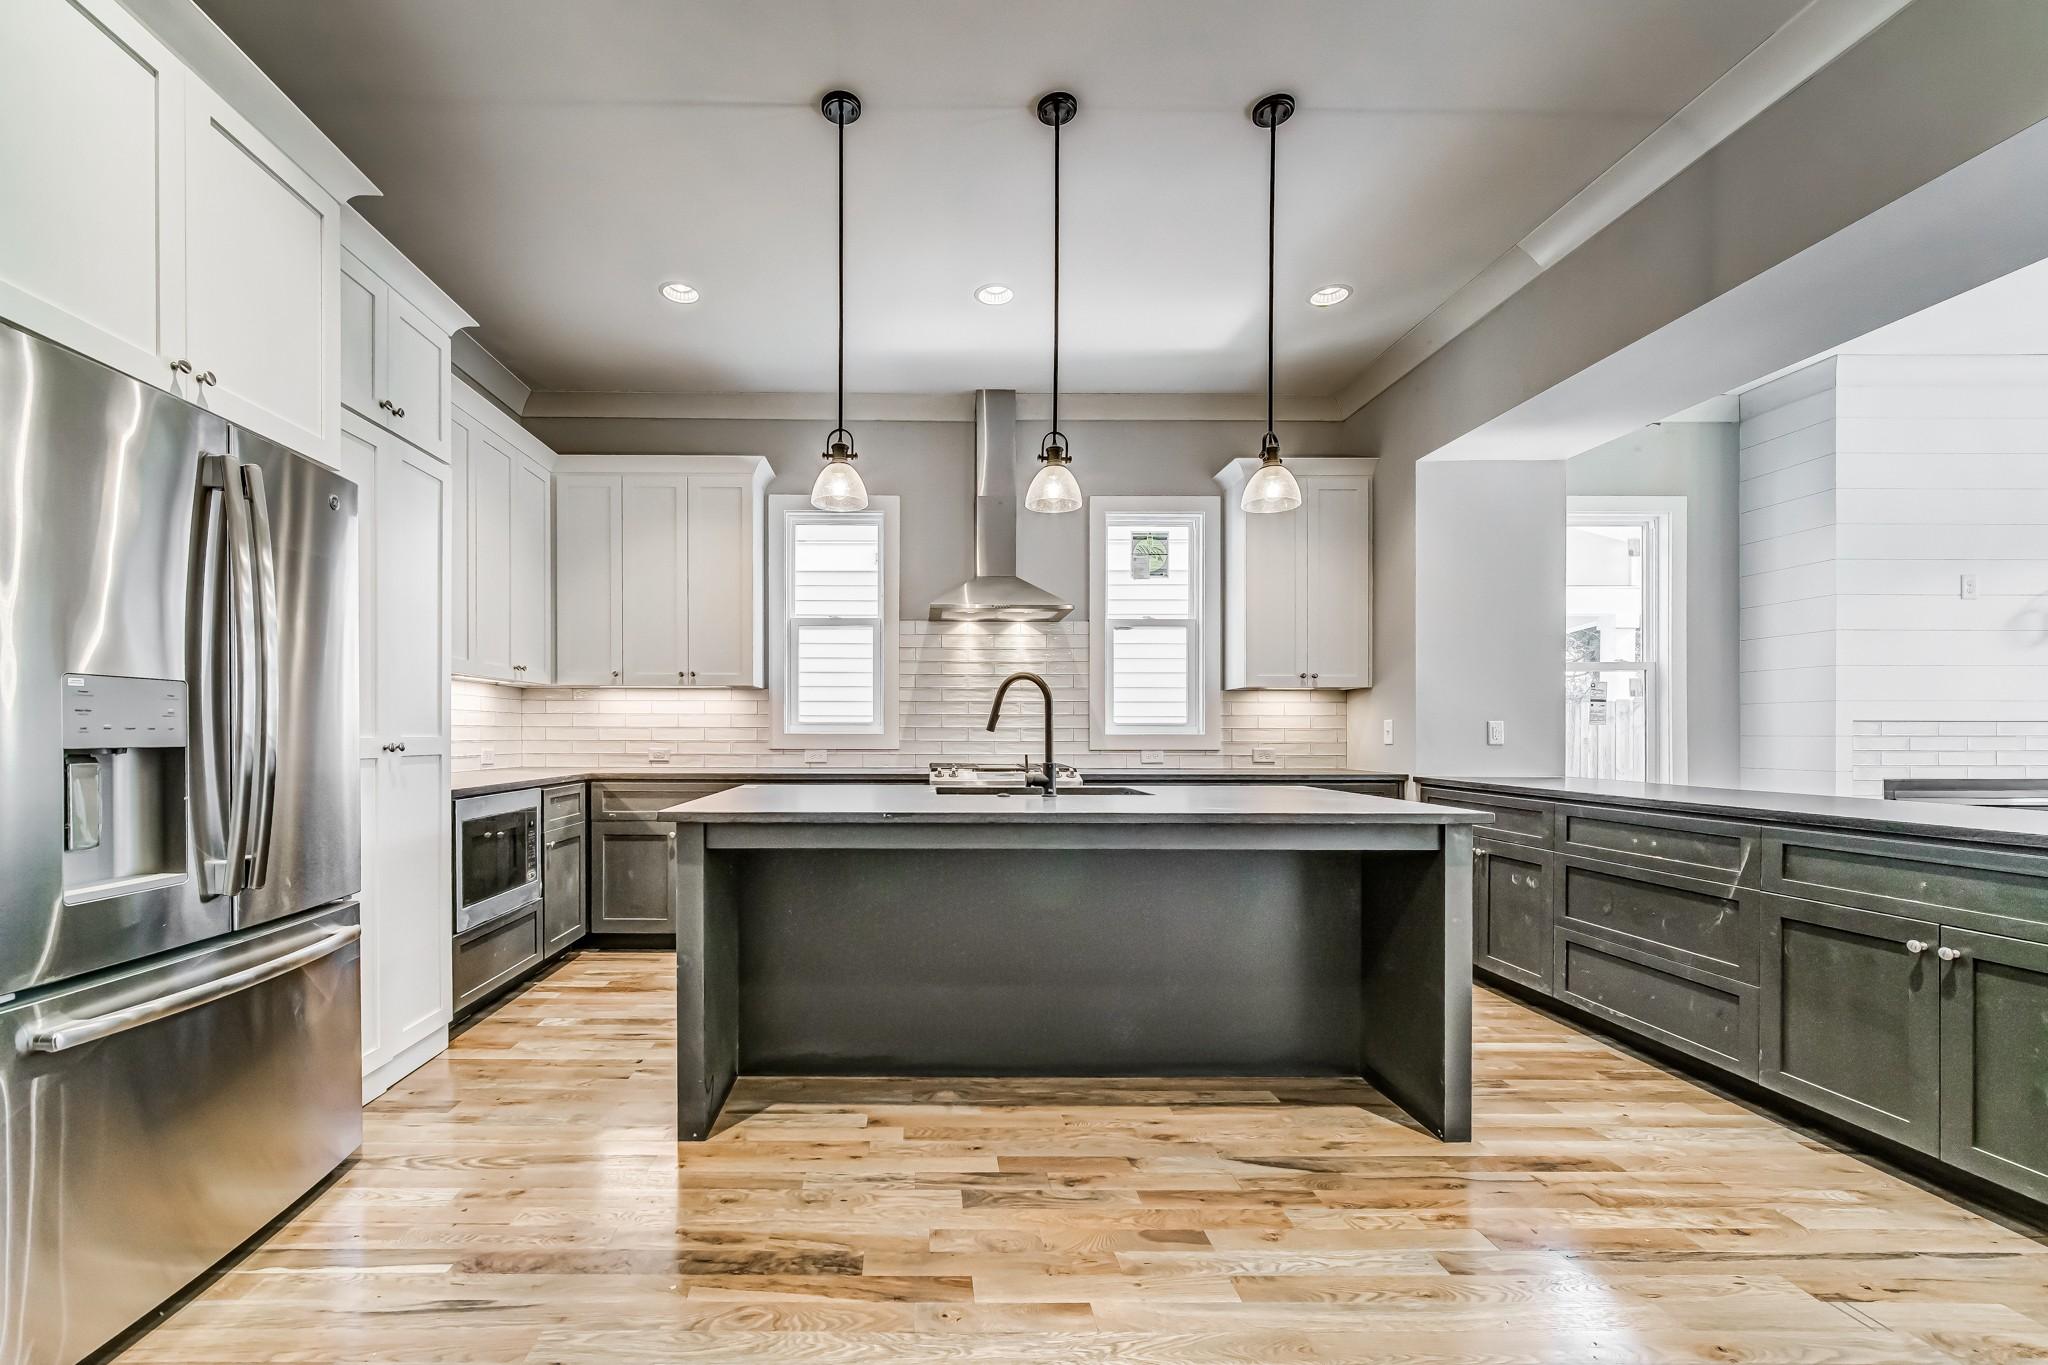 559A Hamilton Avenue, Nashville, TN 37203 - Nashville, TN real estate listing